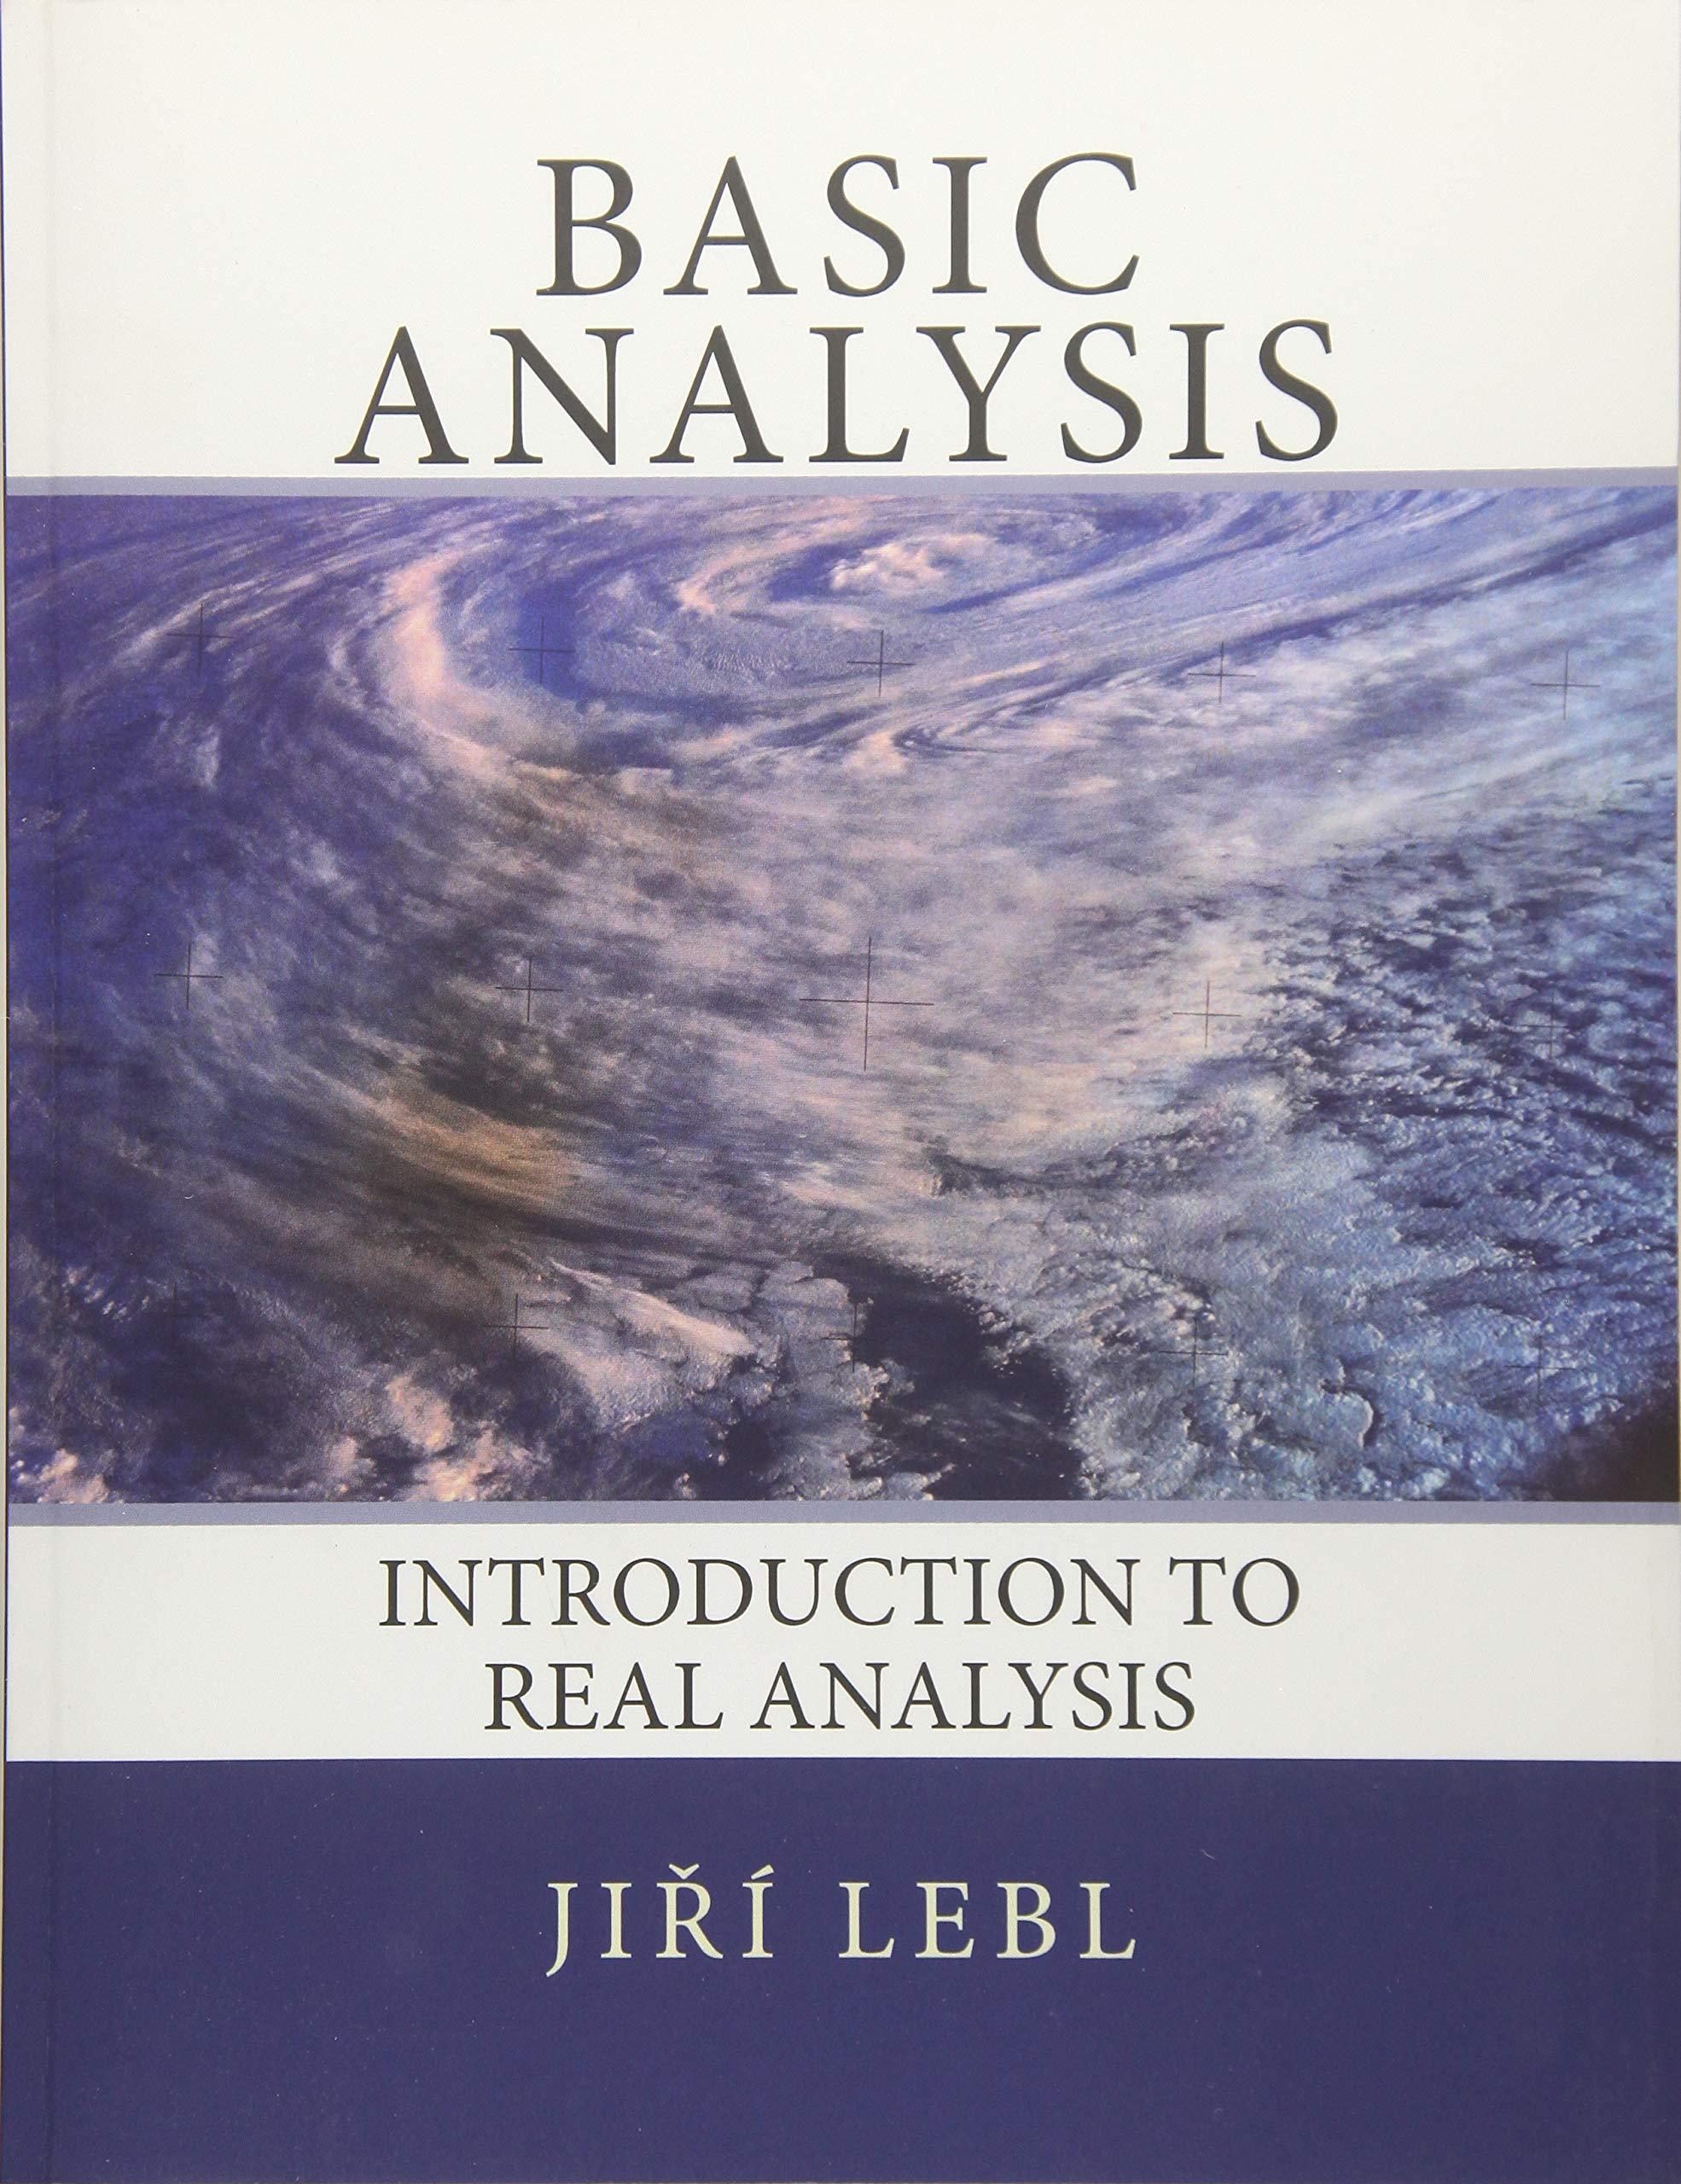 Basic Analysis: Introduction to Real Analysis: Jiri Lebl